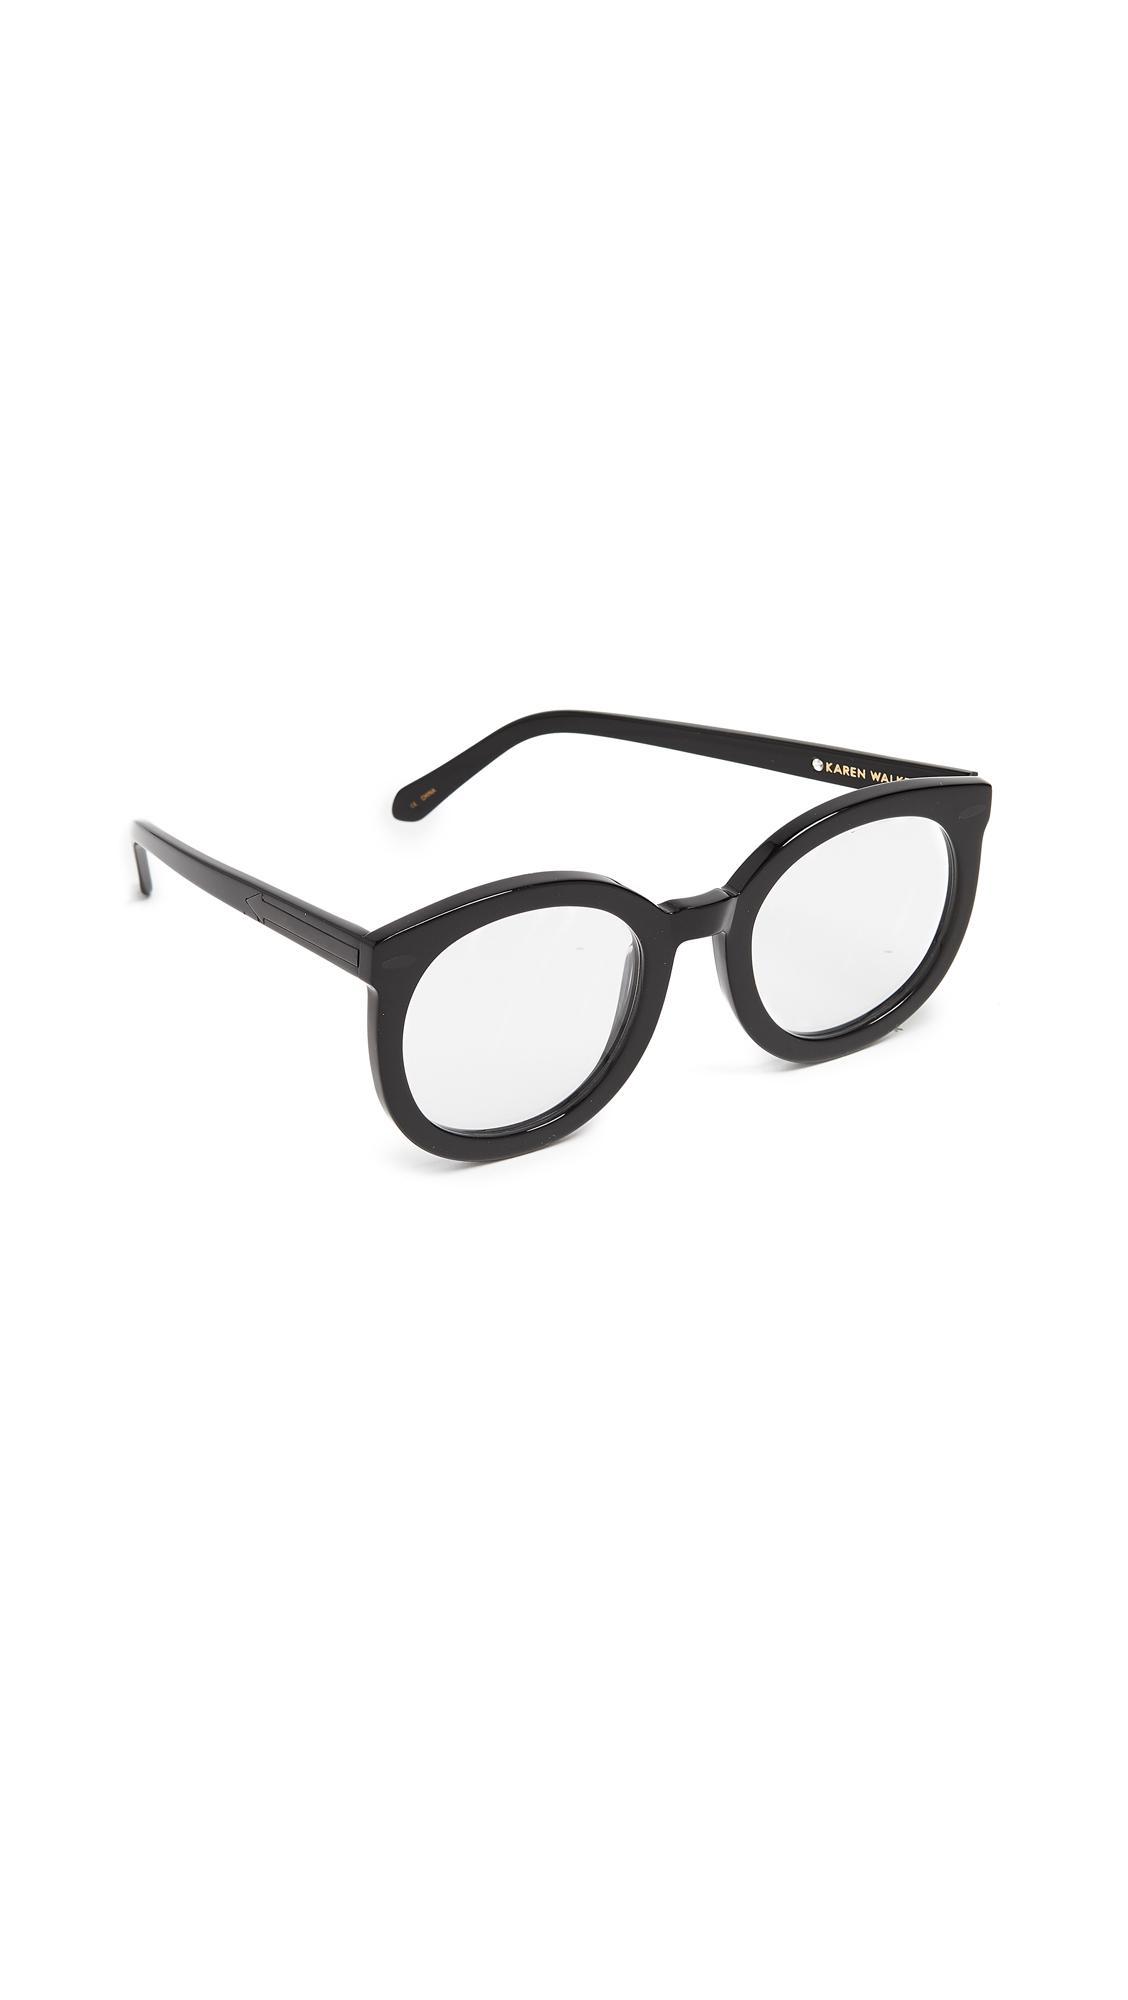 e1c3eda3b44 Karen Walker Super Duper Strength Glasses In Black Clear